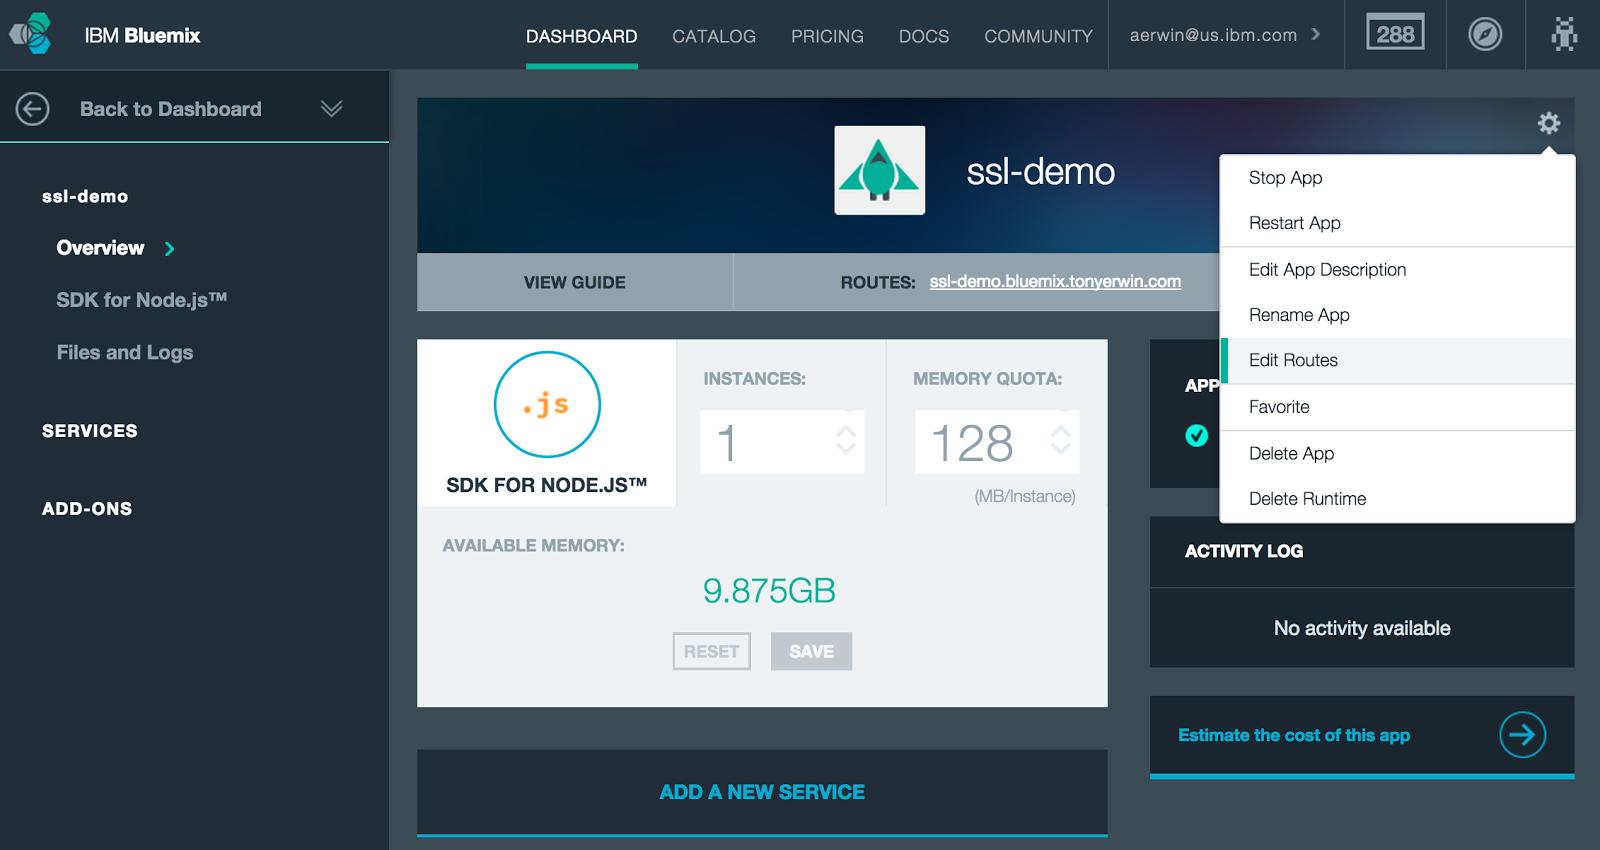 Bluemix UI: App Details Showing Same App With Gear Menu